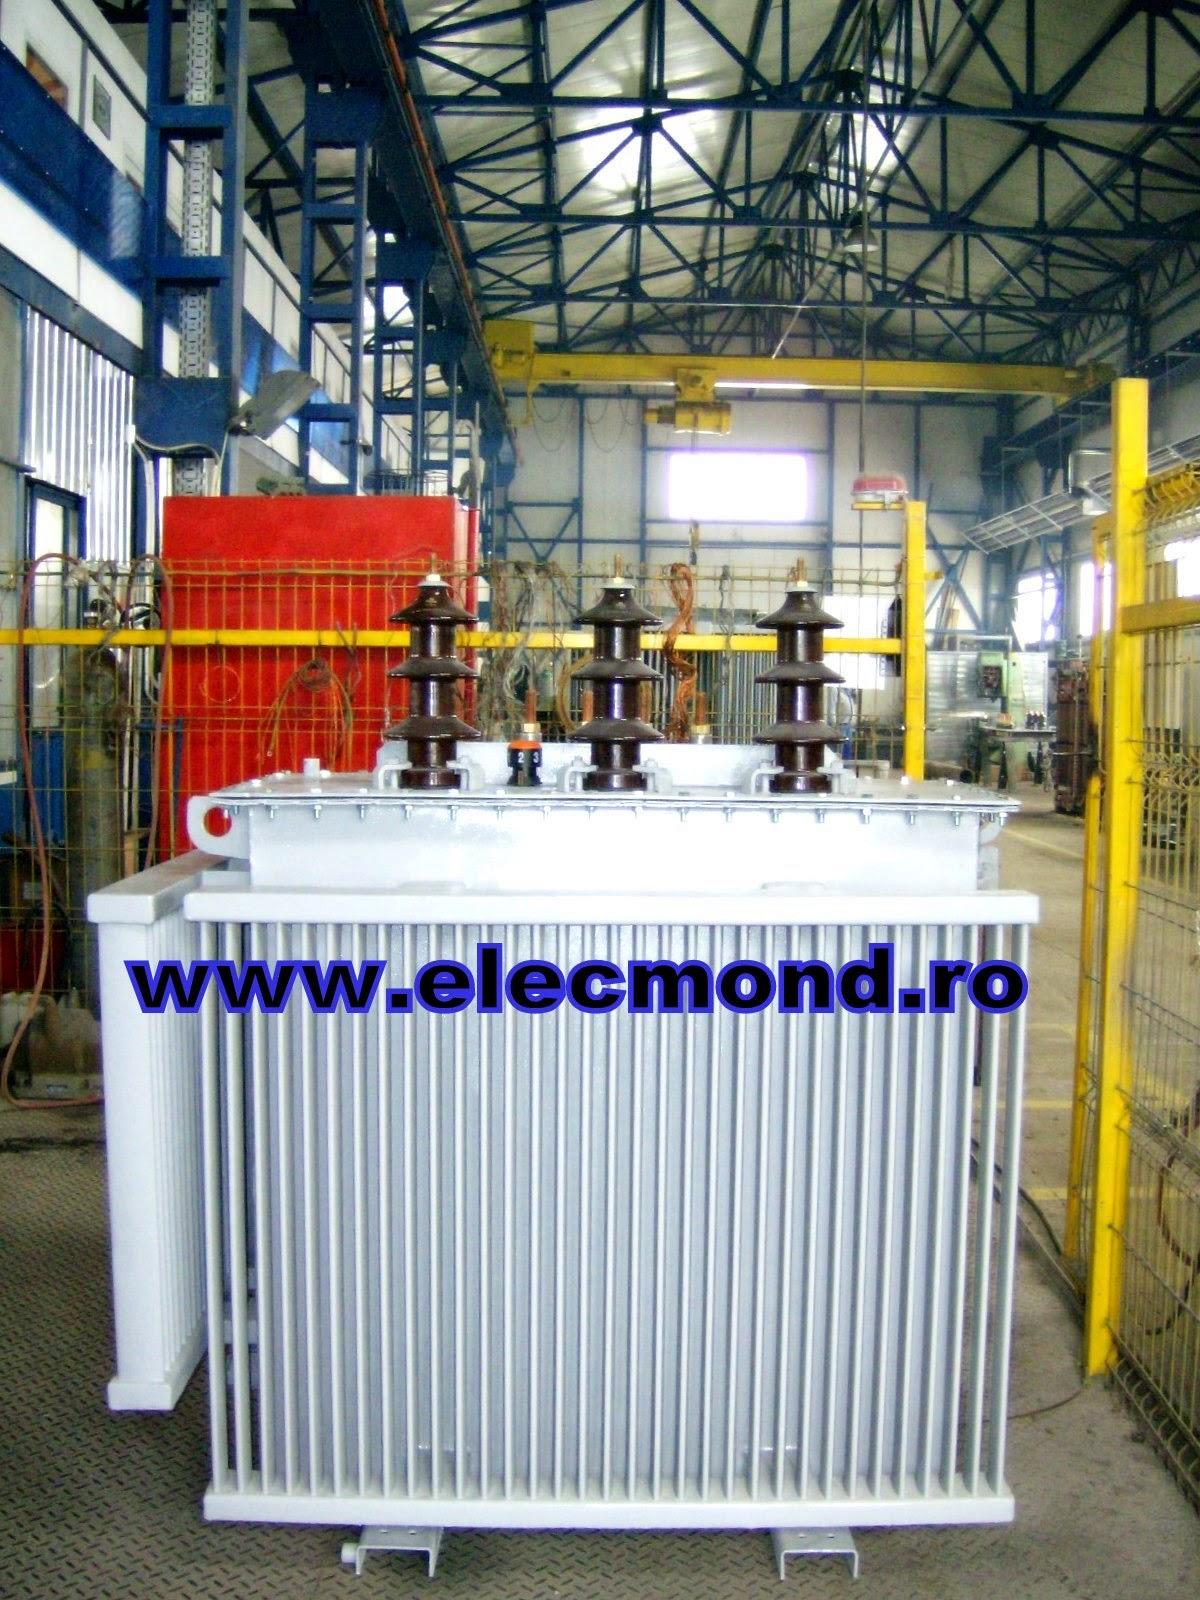 transformator , transformatoare , transformatoare din stoc , elecmond , elecmond blog , transformatoare electrice , transformatoare de putere , reparatii transformatoare , transformator 400 kVA